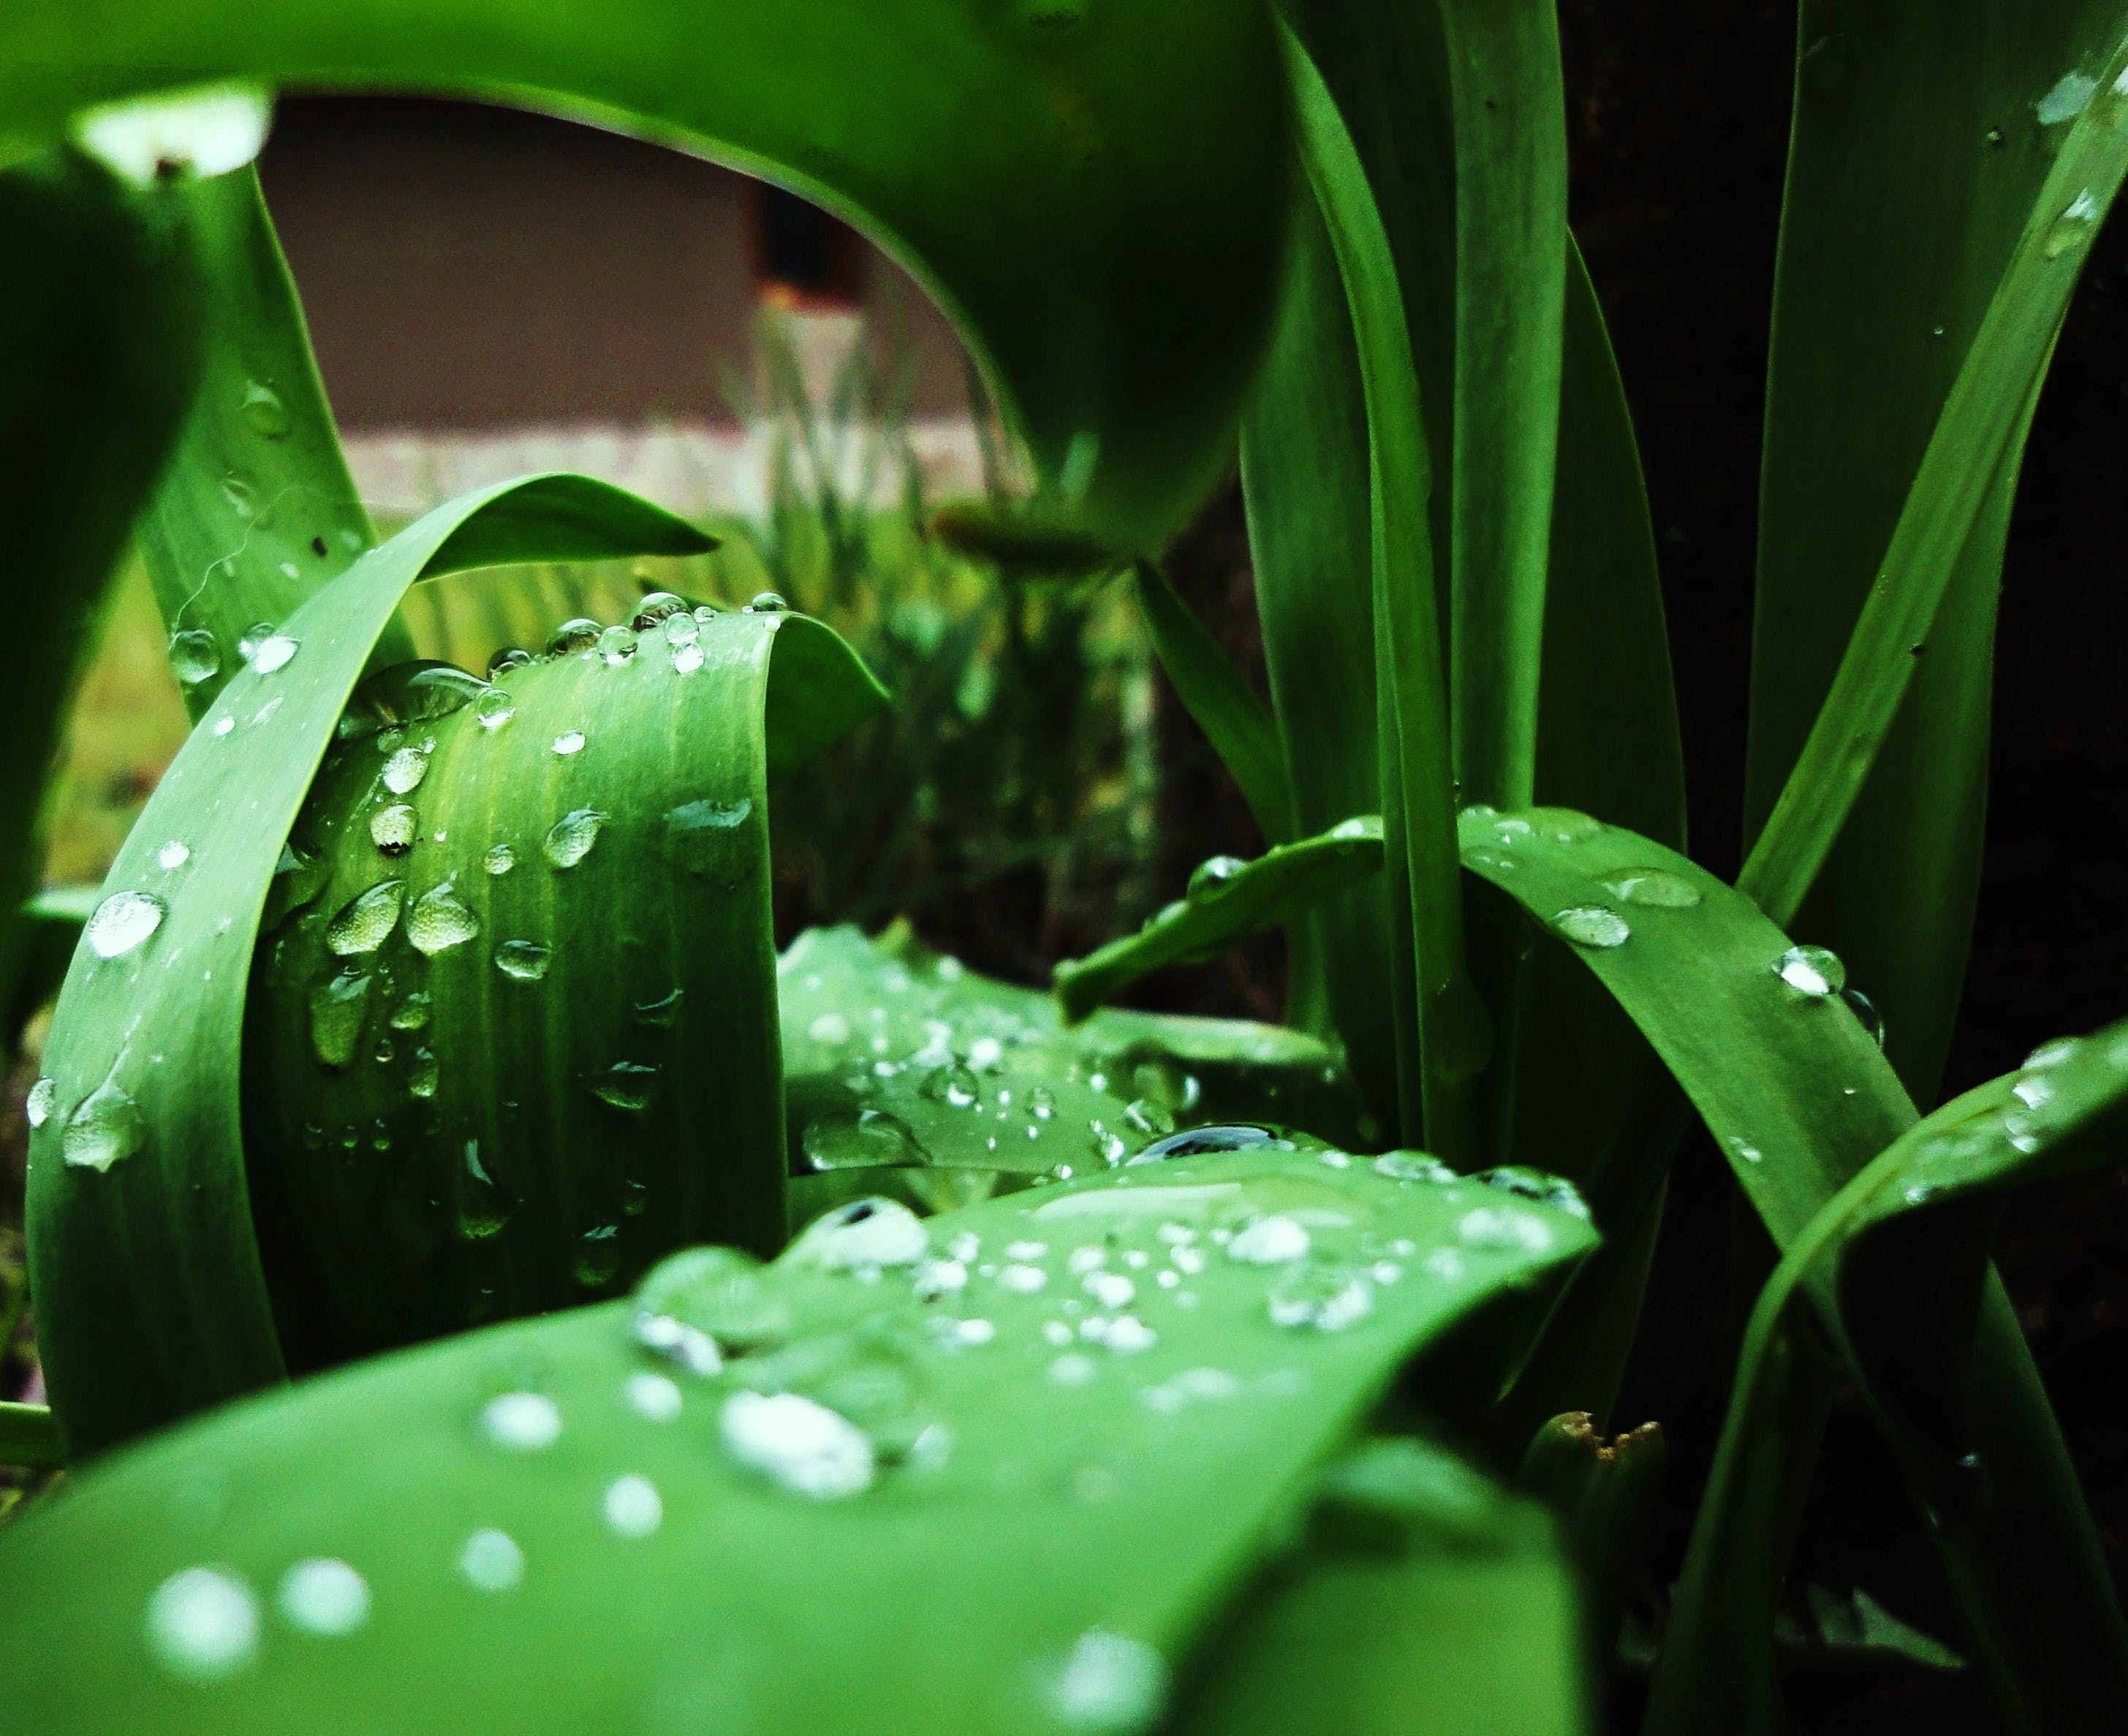 close-up, color, dew